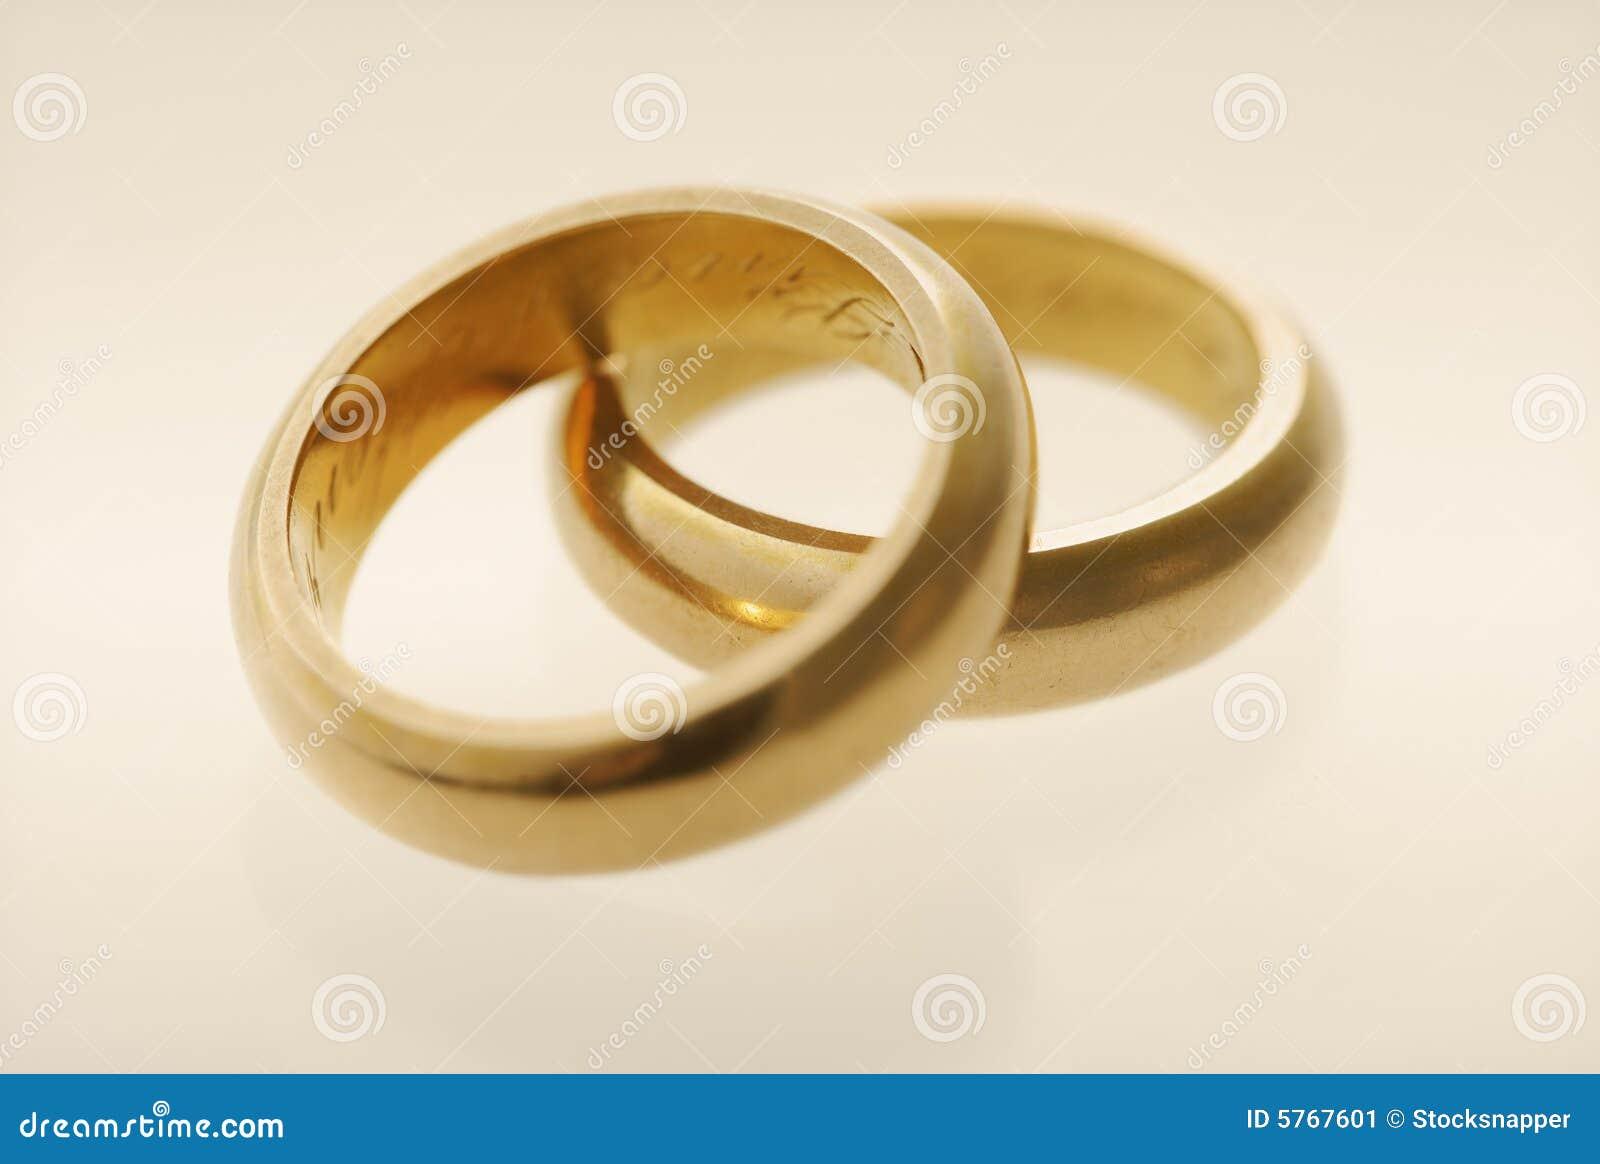 old wedding rings stock image - Old Wedding Rings